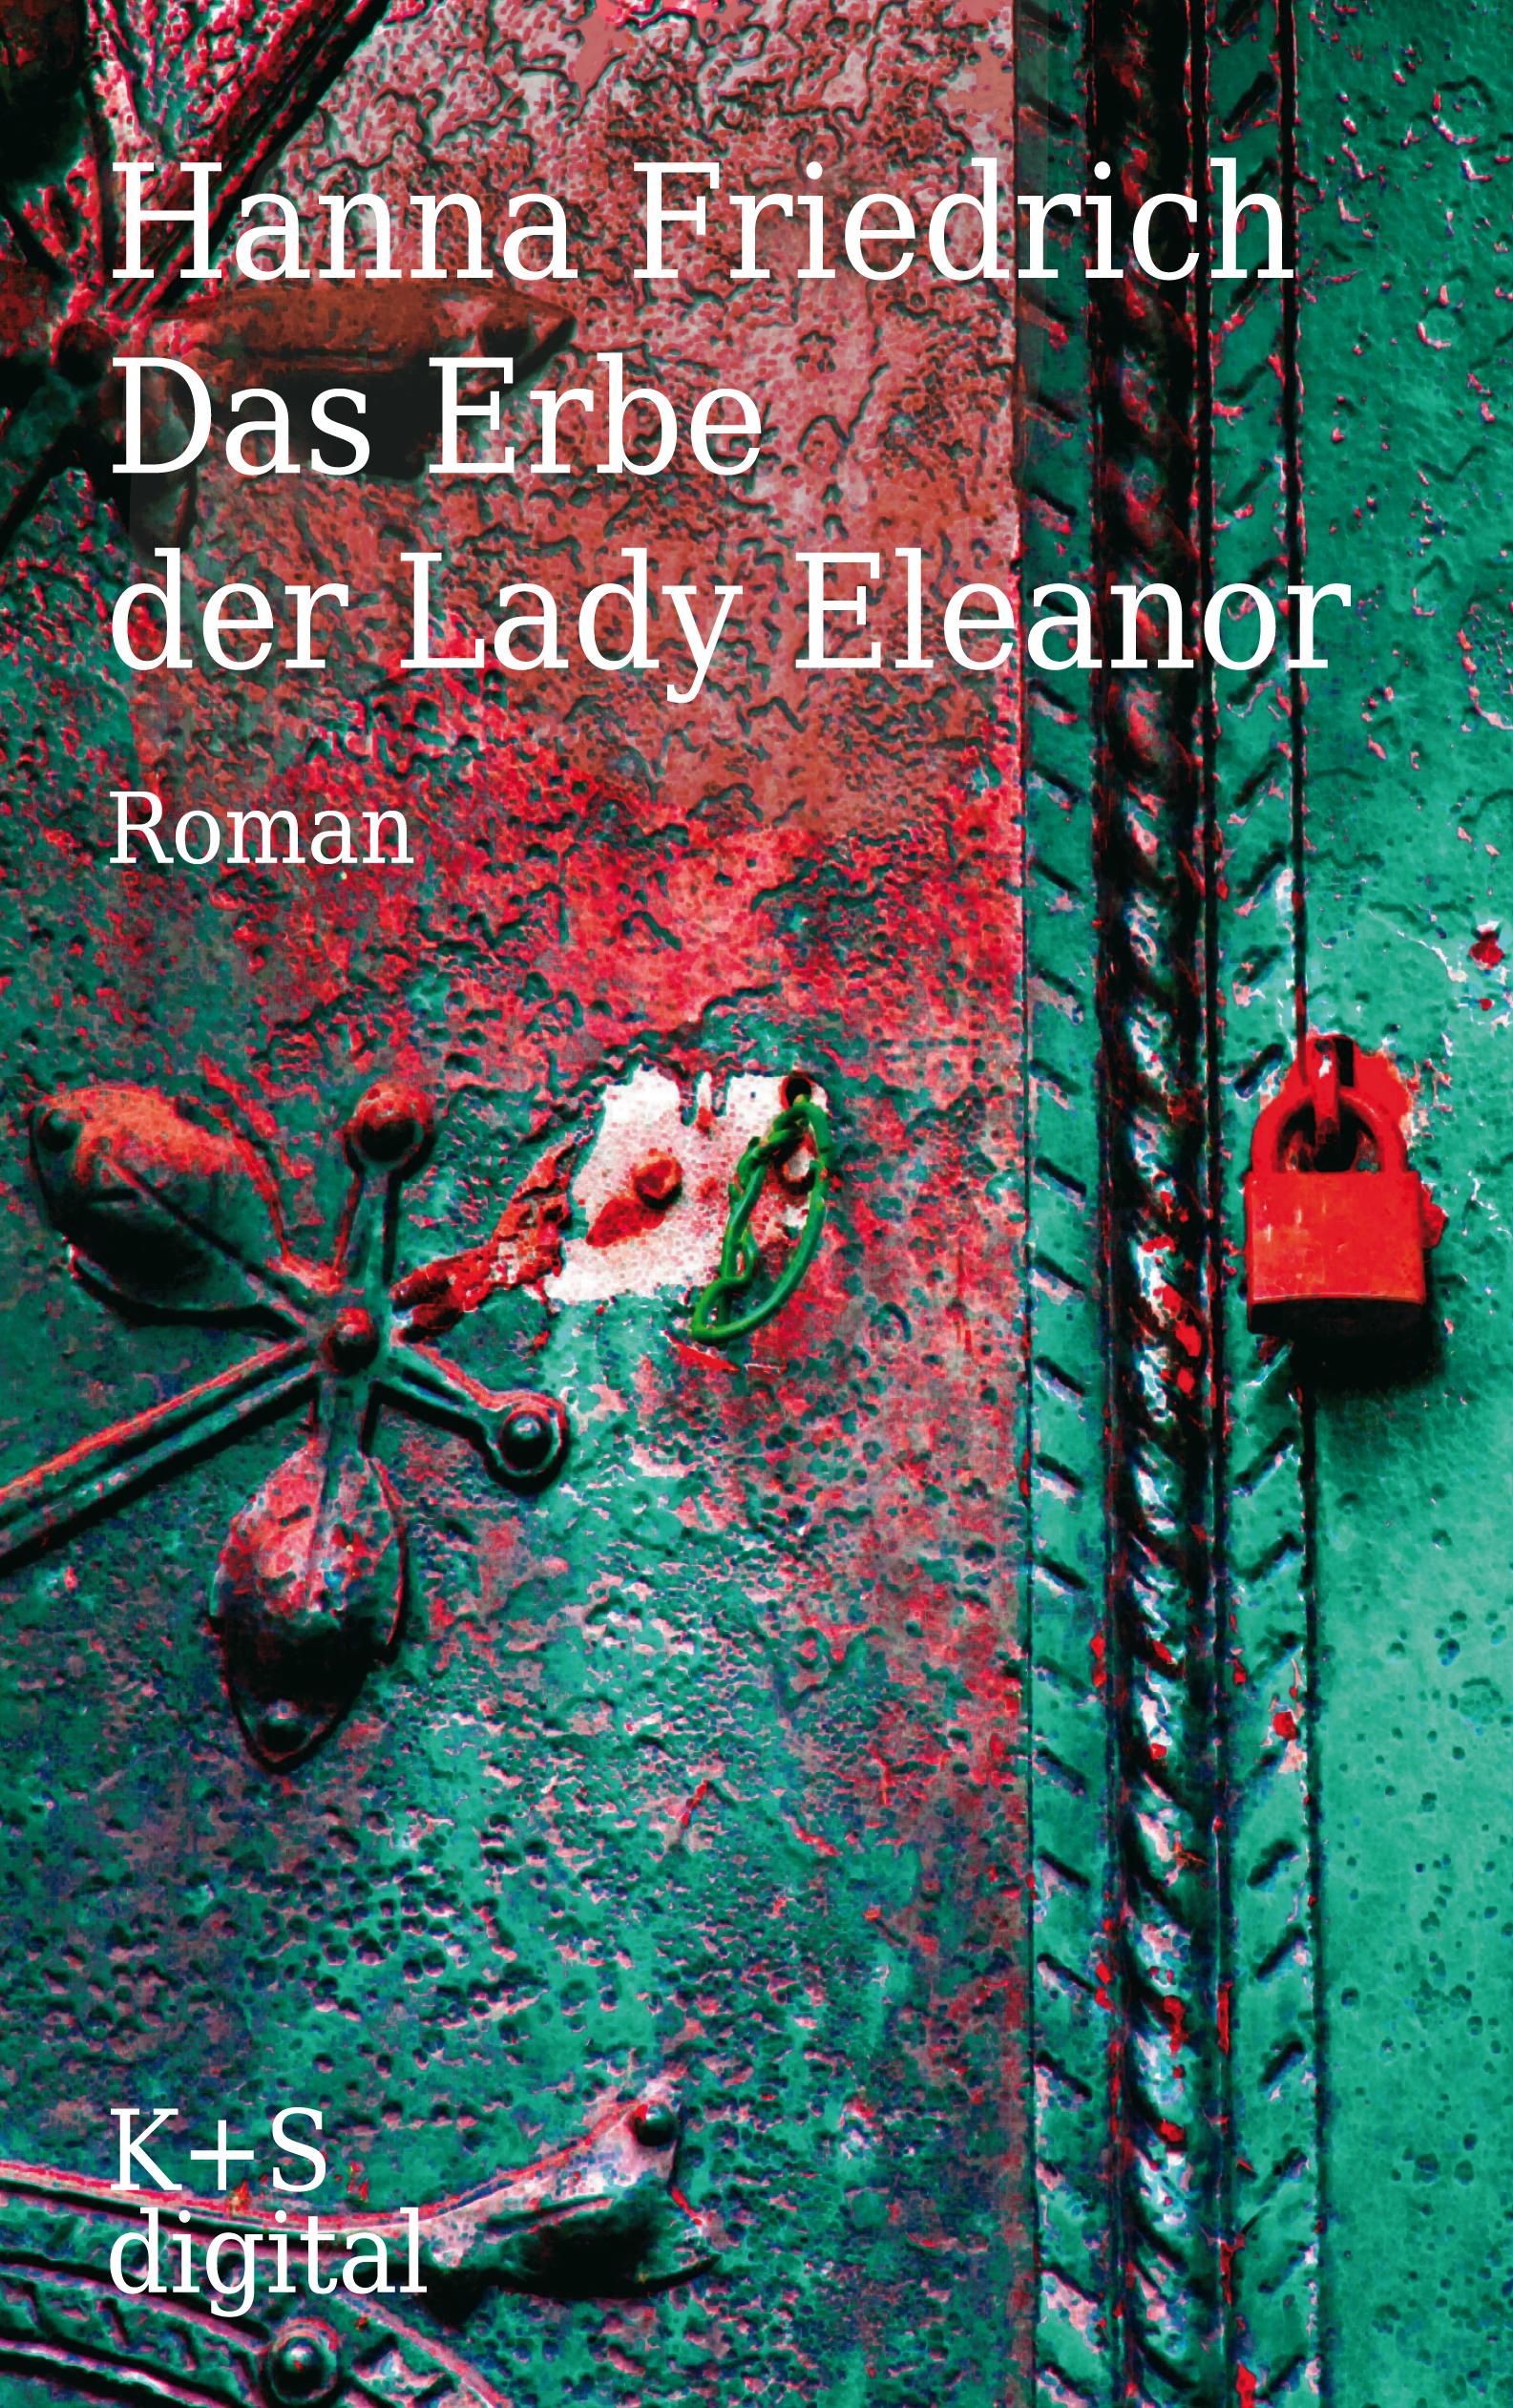 Hanna Friedrich Das Erbe der Lady Eleanor friedrich brockhaus das legitimitatsprincip german edition